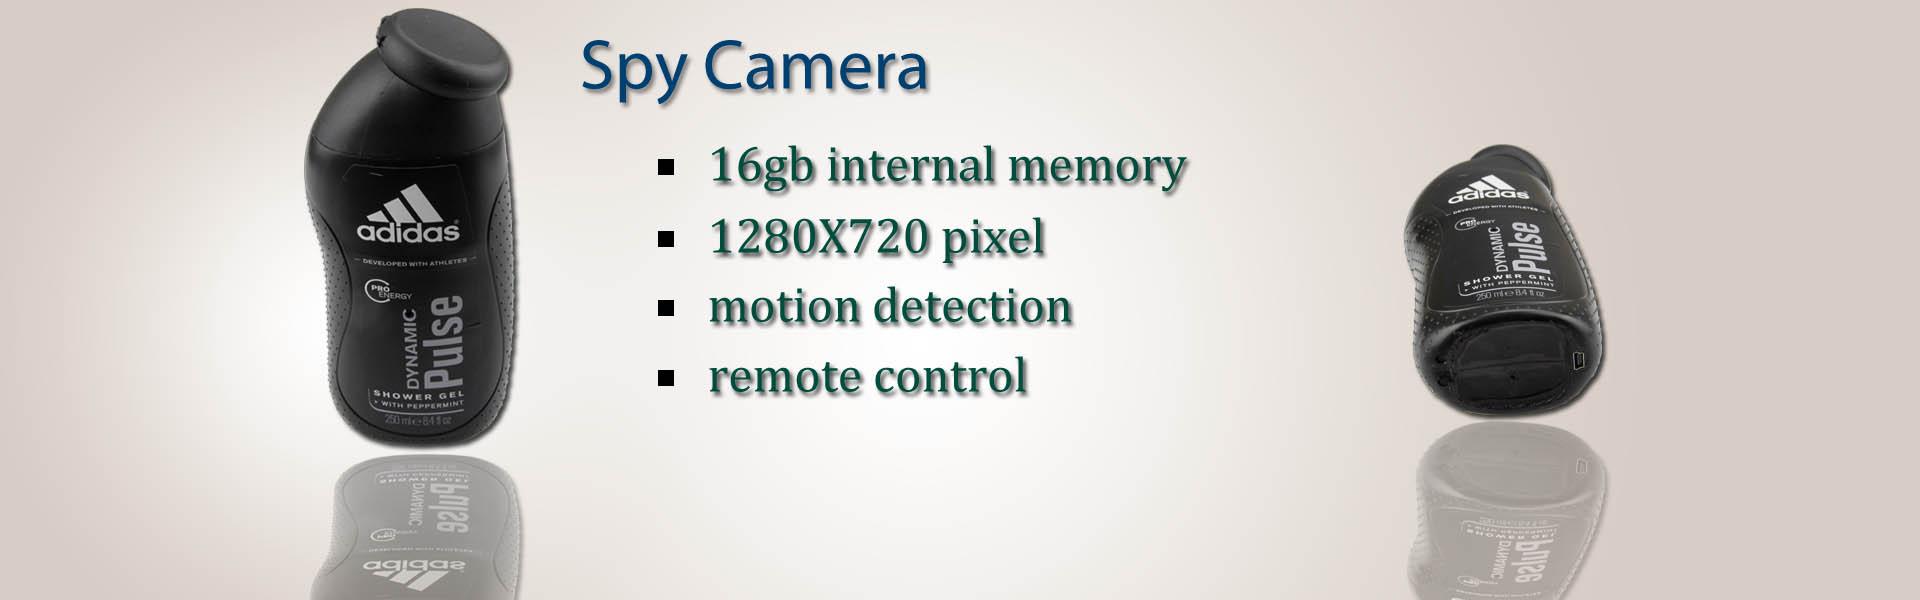 Bathroom Spy camera | New Men's Shower Gel HD Bathroom Spy Camera 720P DVR(Motion Detection+Remote Control)